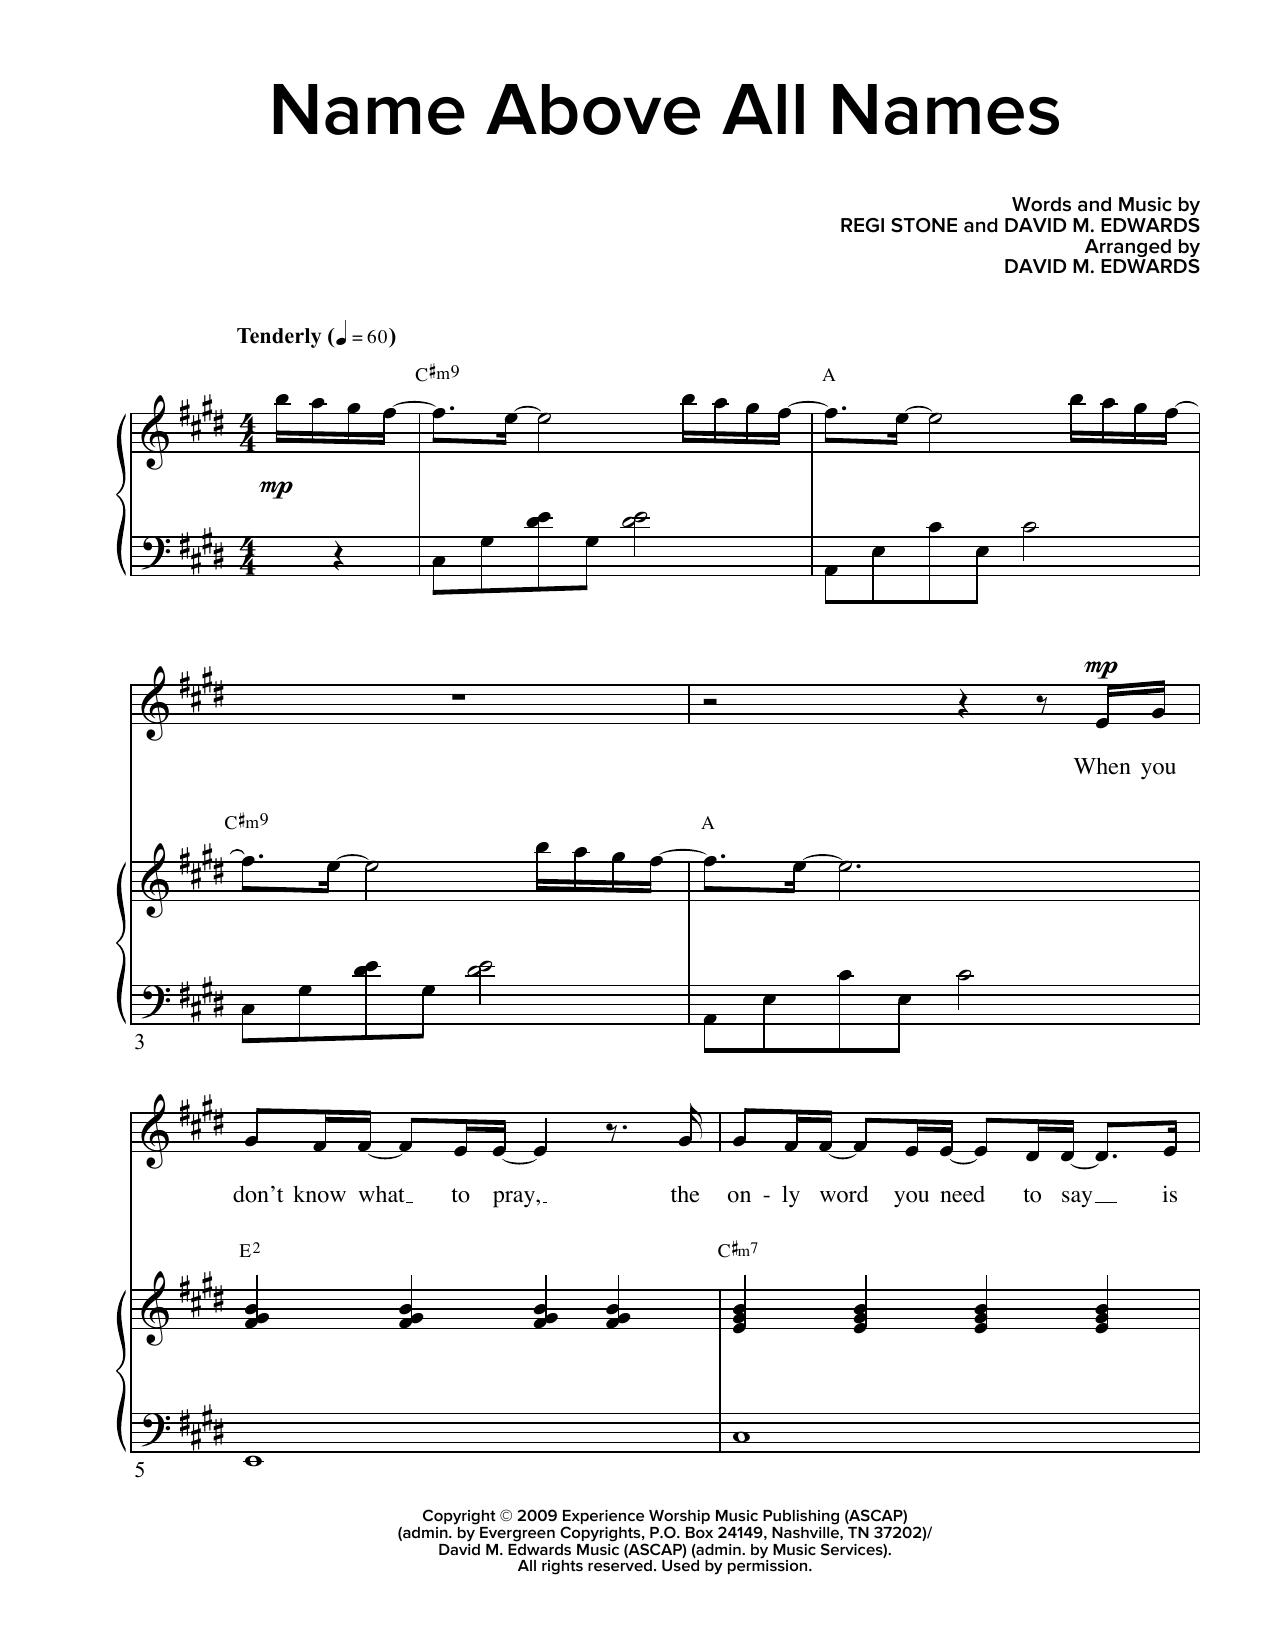 Regi Stone and David M. Edwards Name Above All Names (arr. David M. Edwards) sheet music notes and chords. Download Printable PDF.